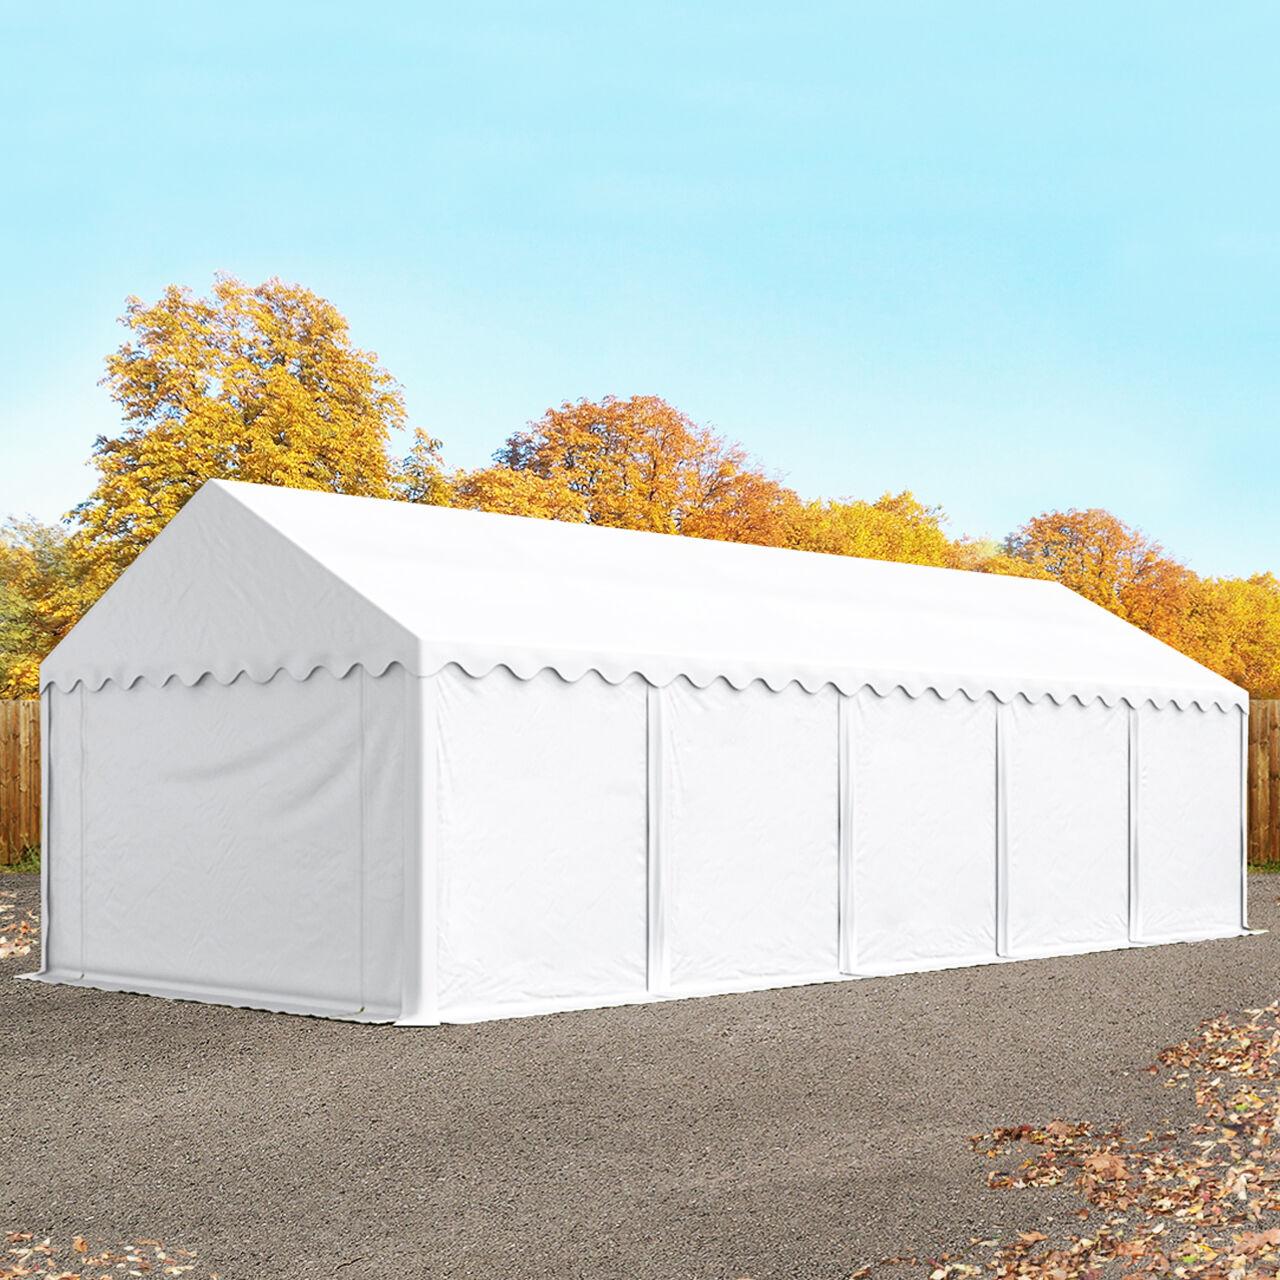 Toolport Tende Capannone 4x10m PVC 500 g/m² bianco impermeabile